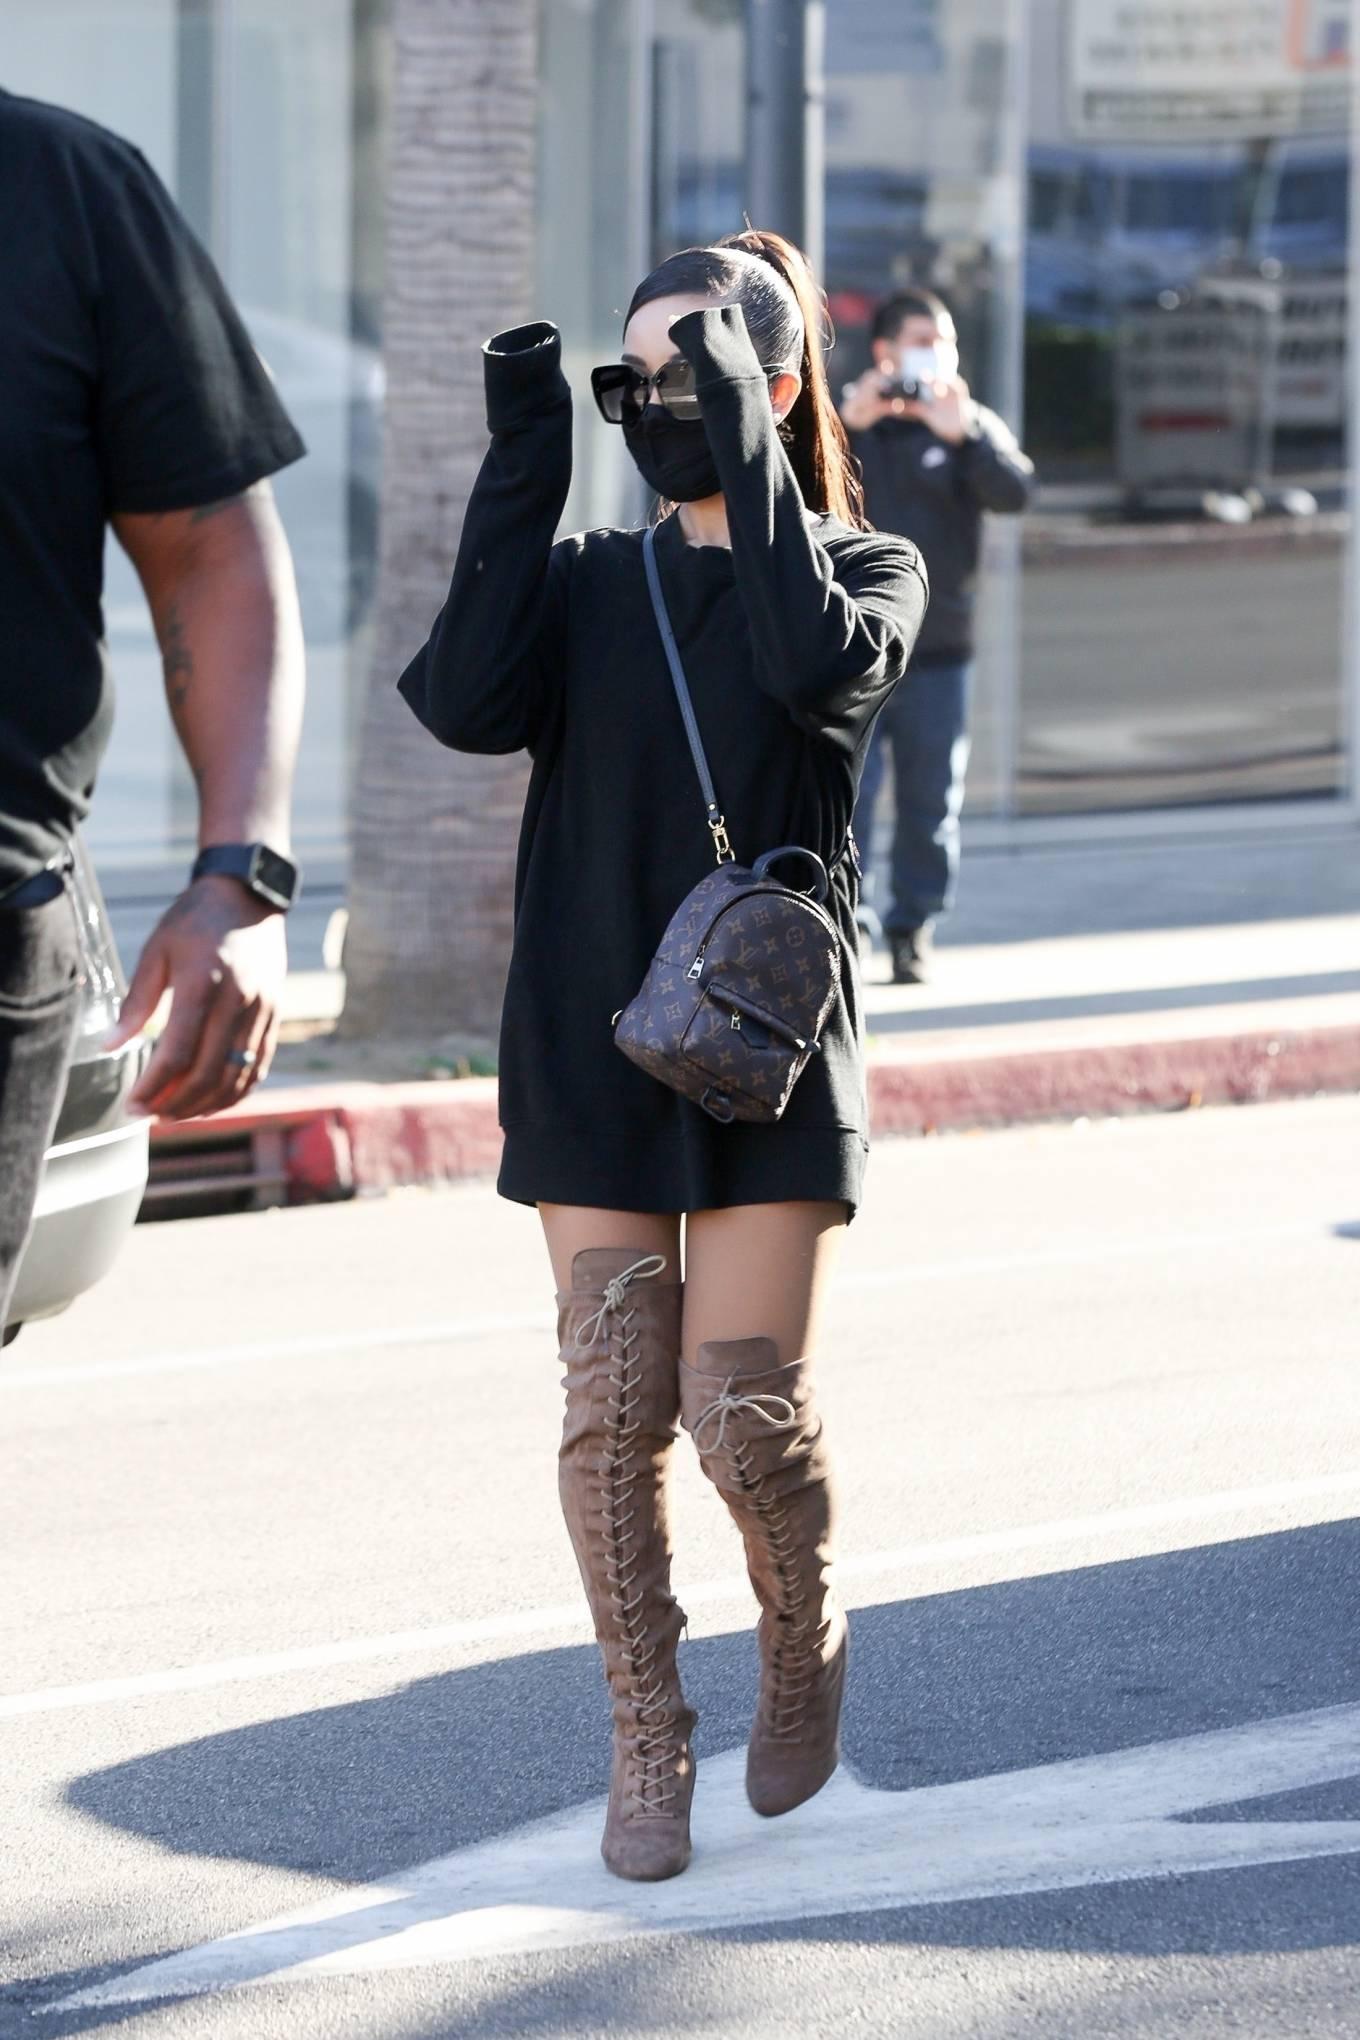 Ariana Grande Candids : ariana, grande, candids, Ariana, Grande, Shopping, Candids, Beverly, Hills-10, GotCeleb